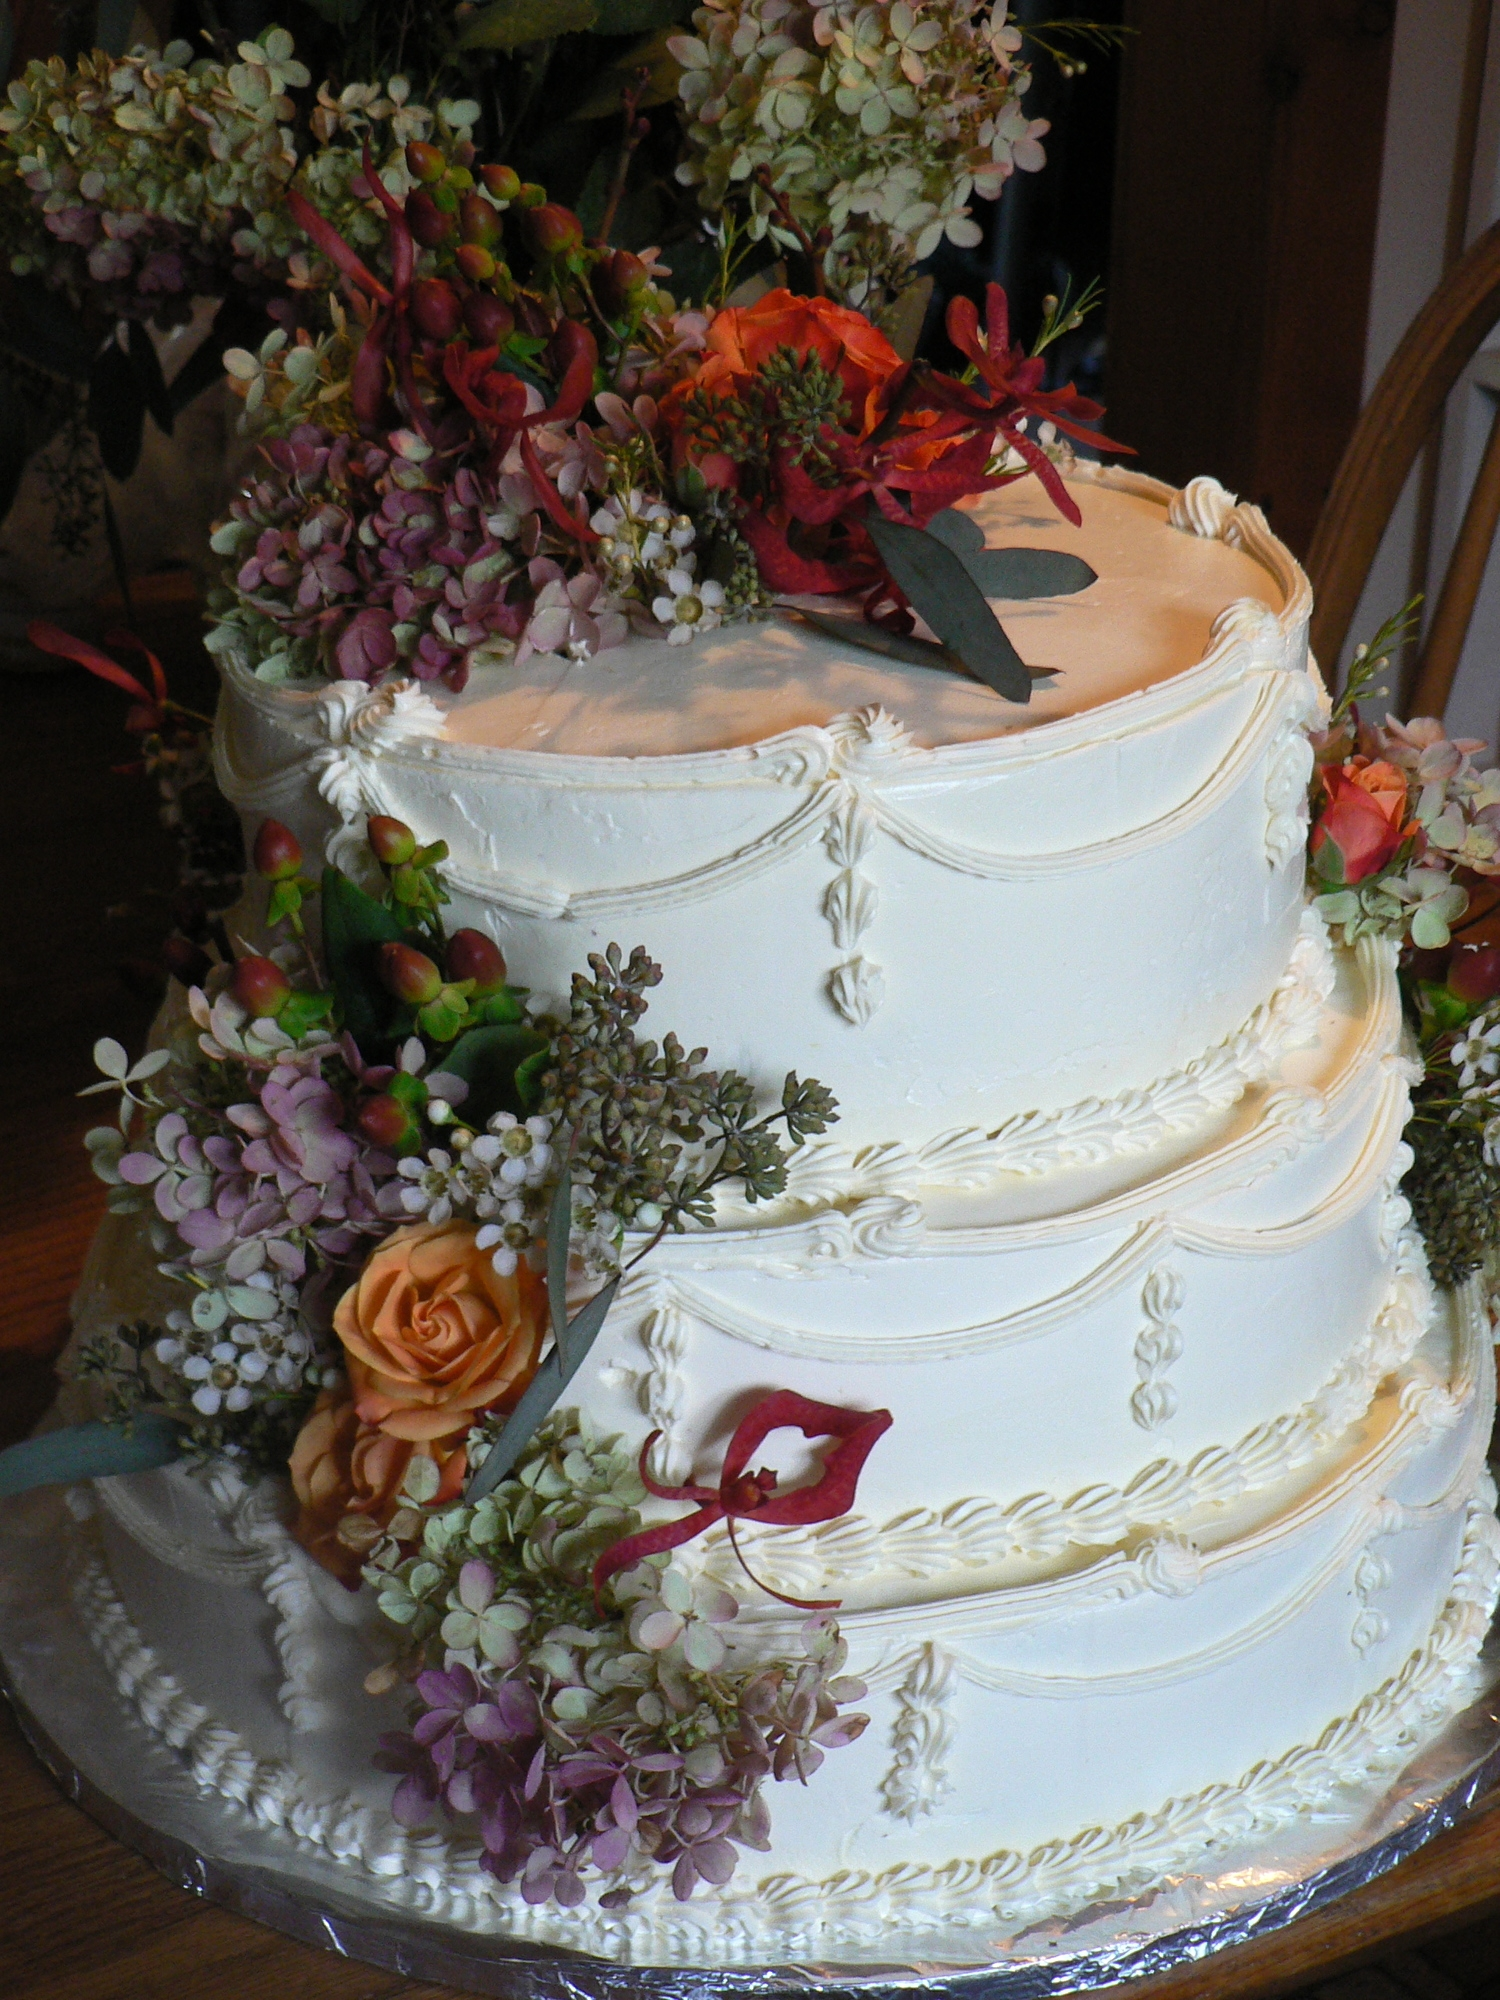 More wedding cakes-3.JPG